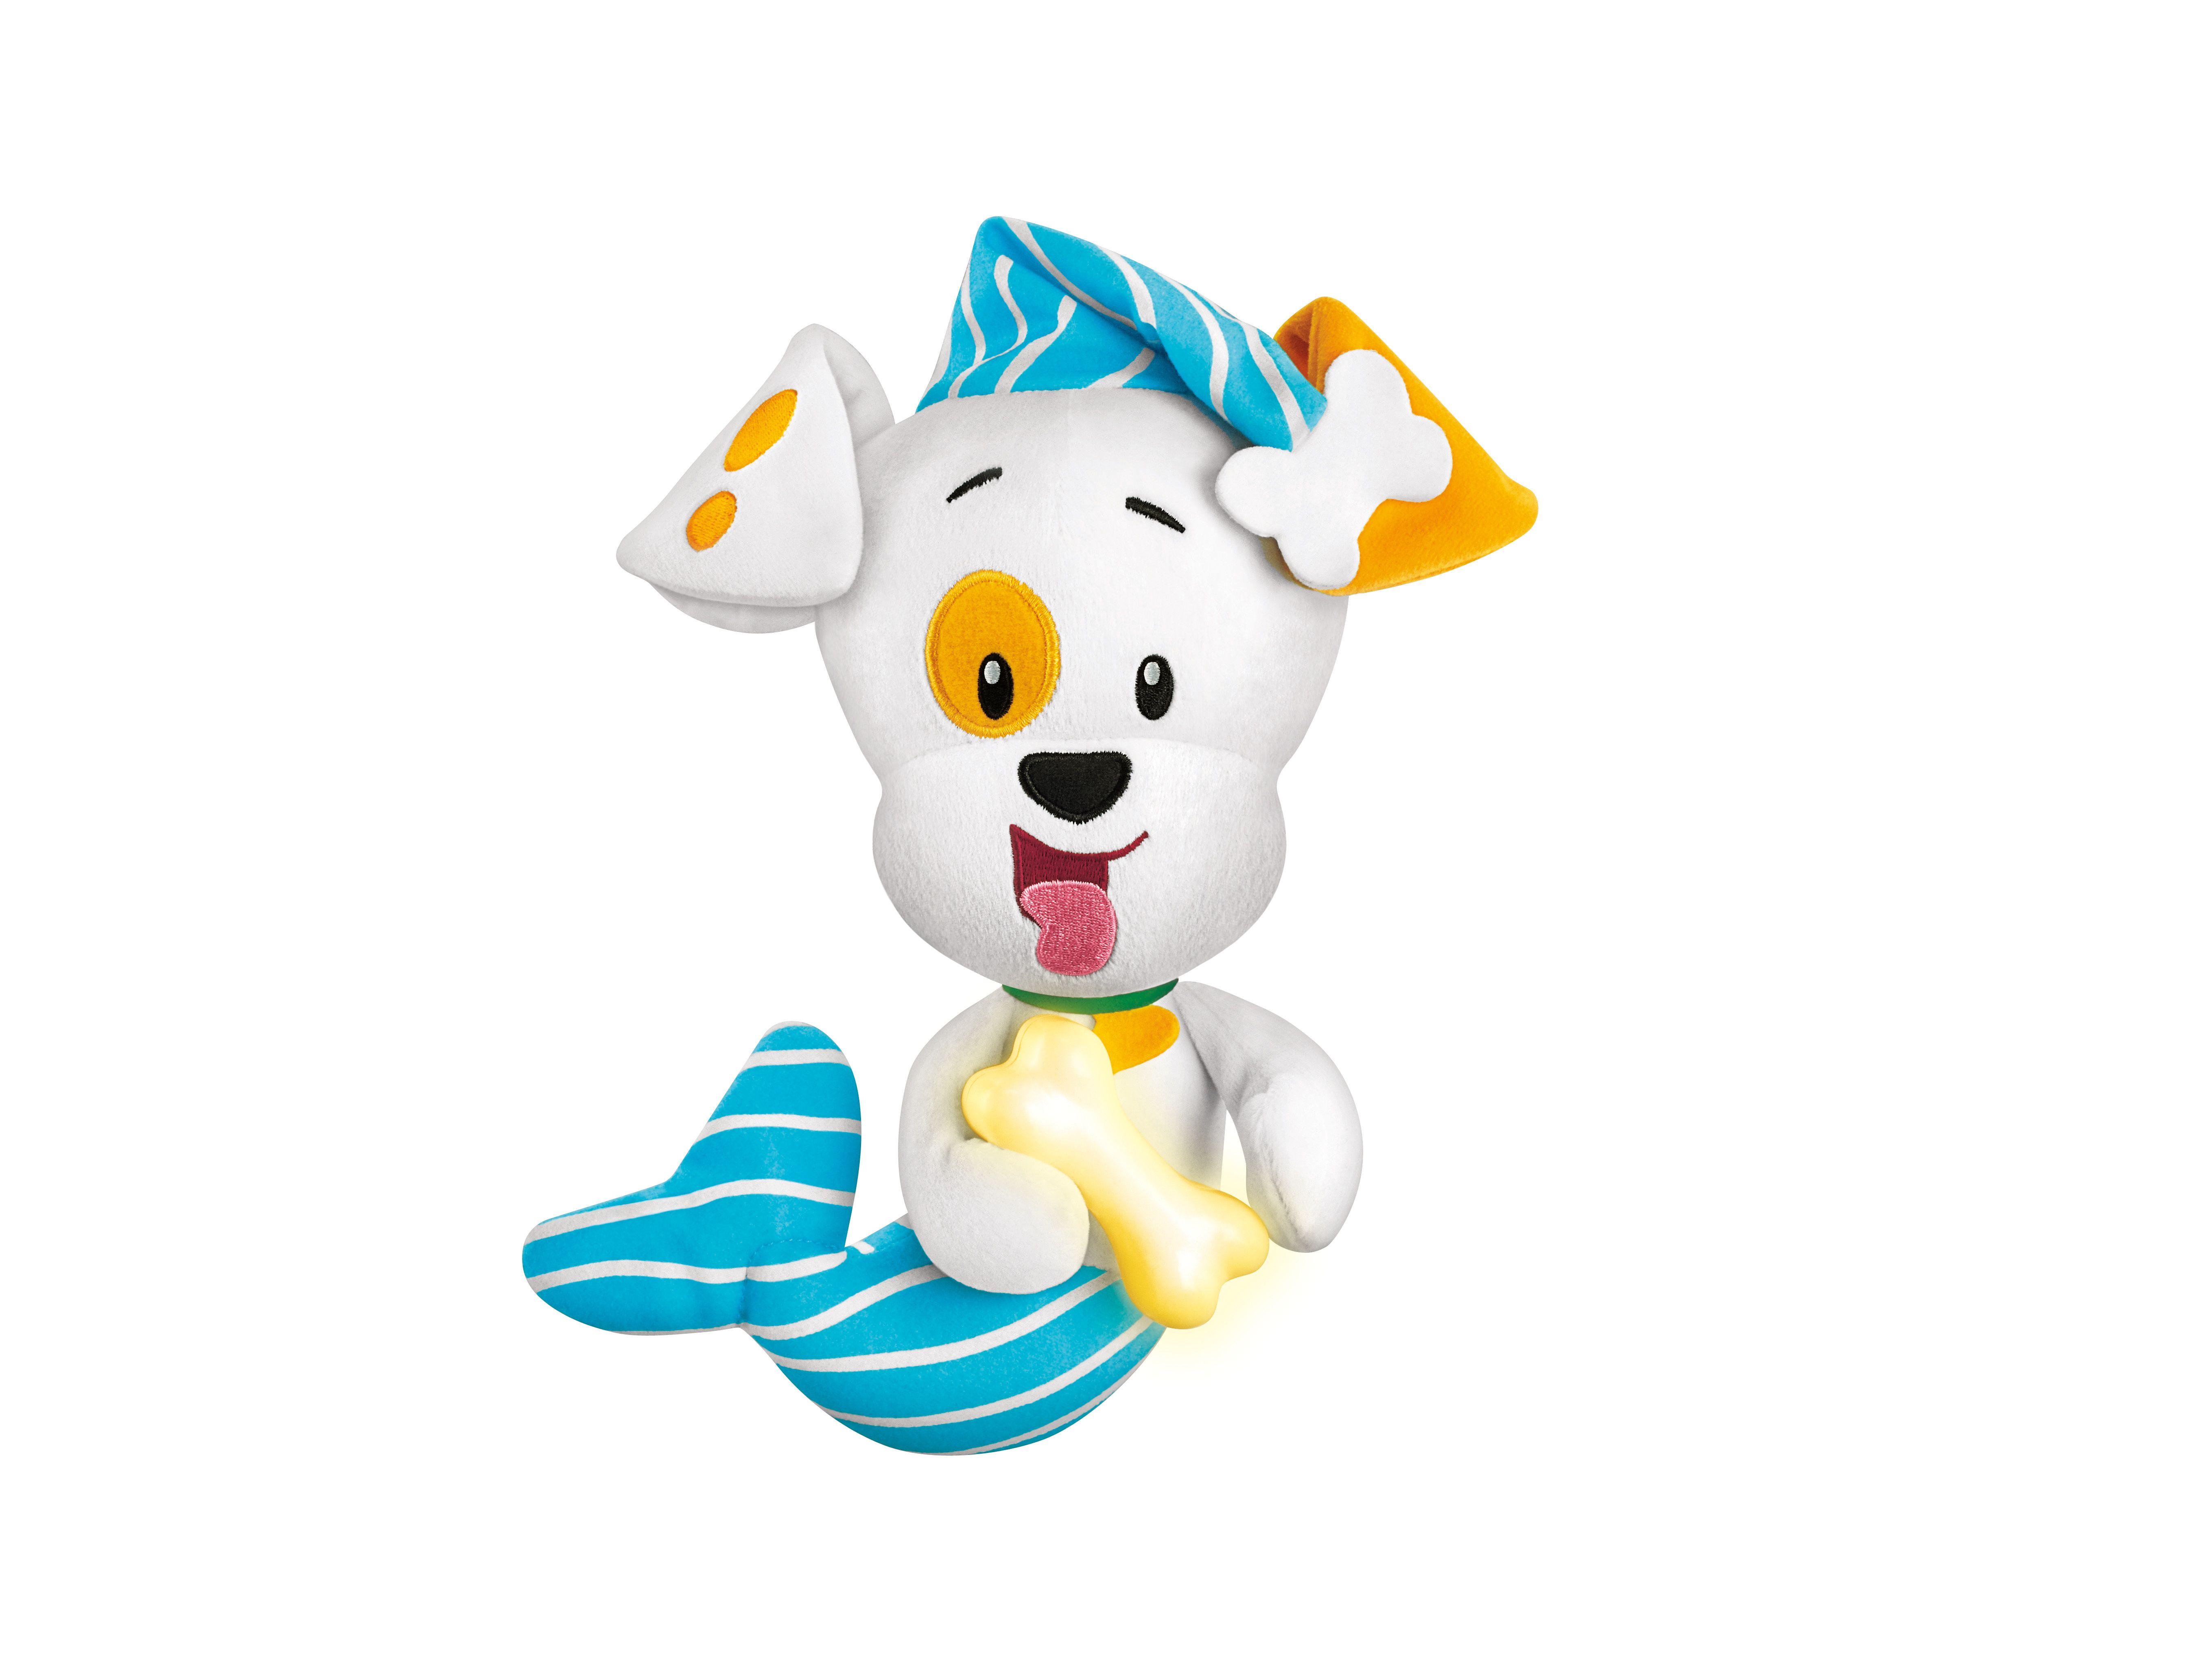 lullaby bubble puppy highres jpg jpeg image 5436 4080 pixels